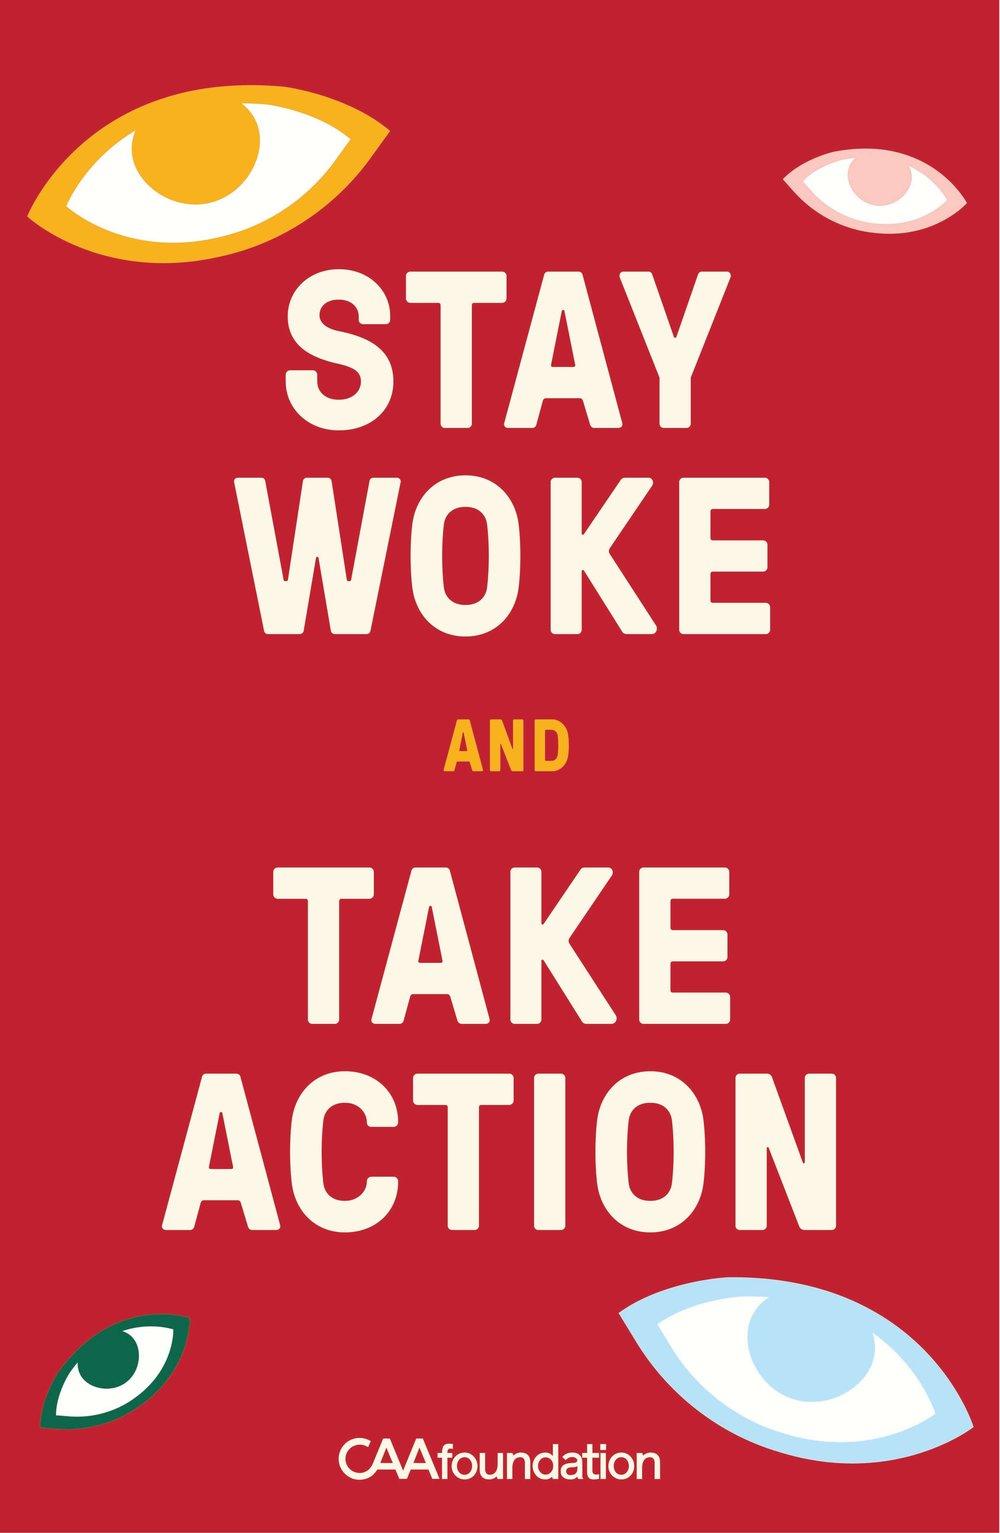 Take_Action_Posters_v5-15.jpg